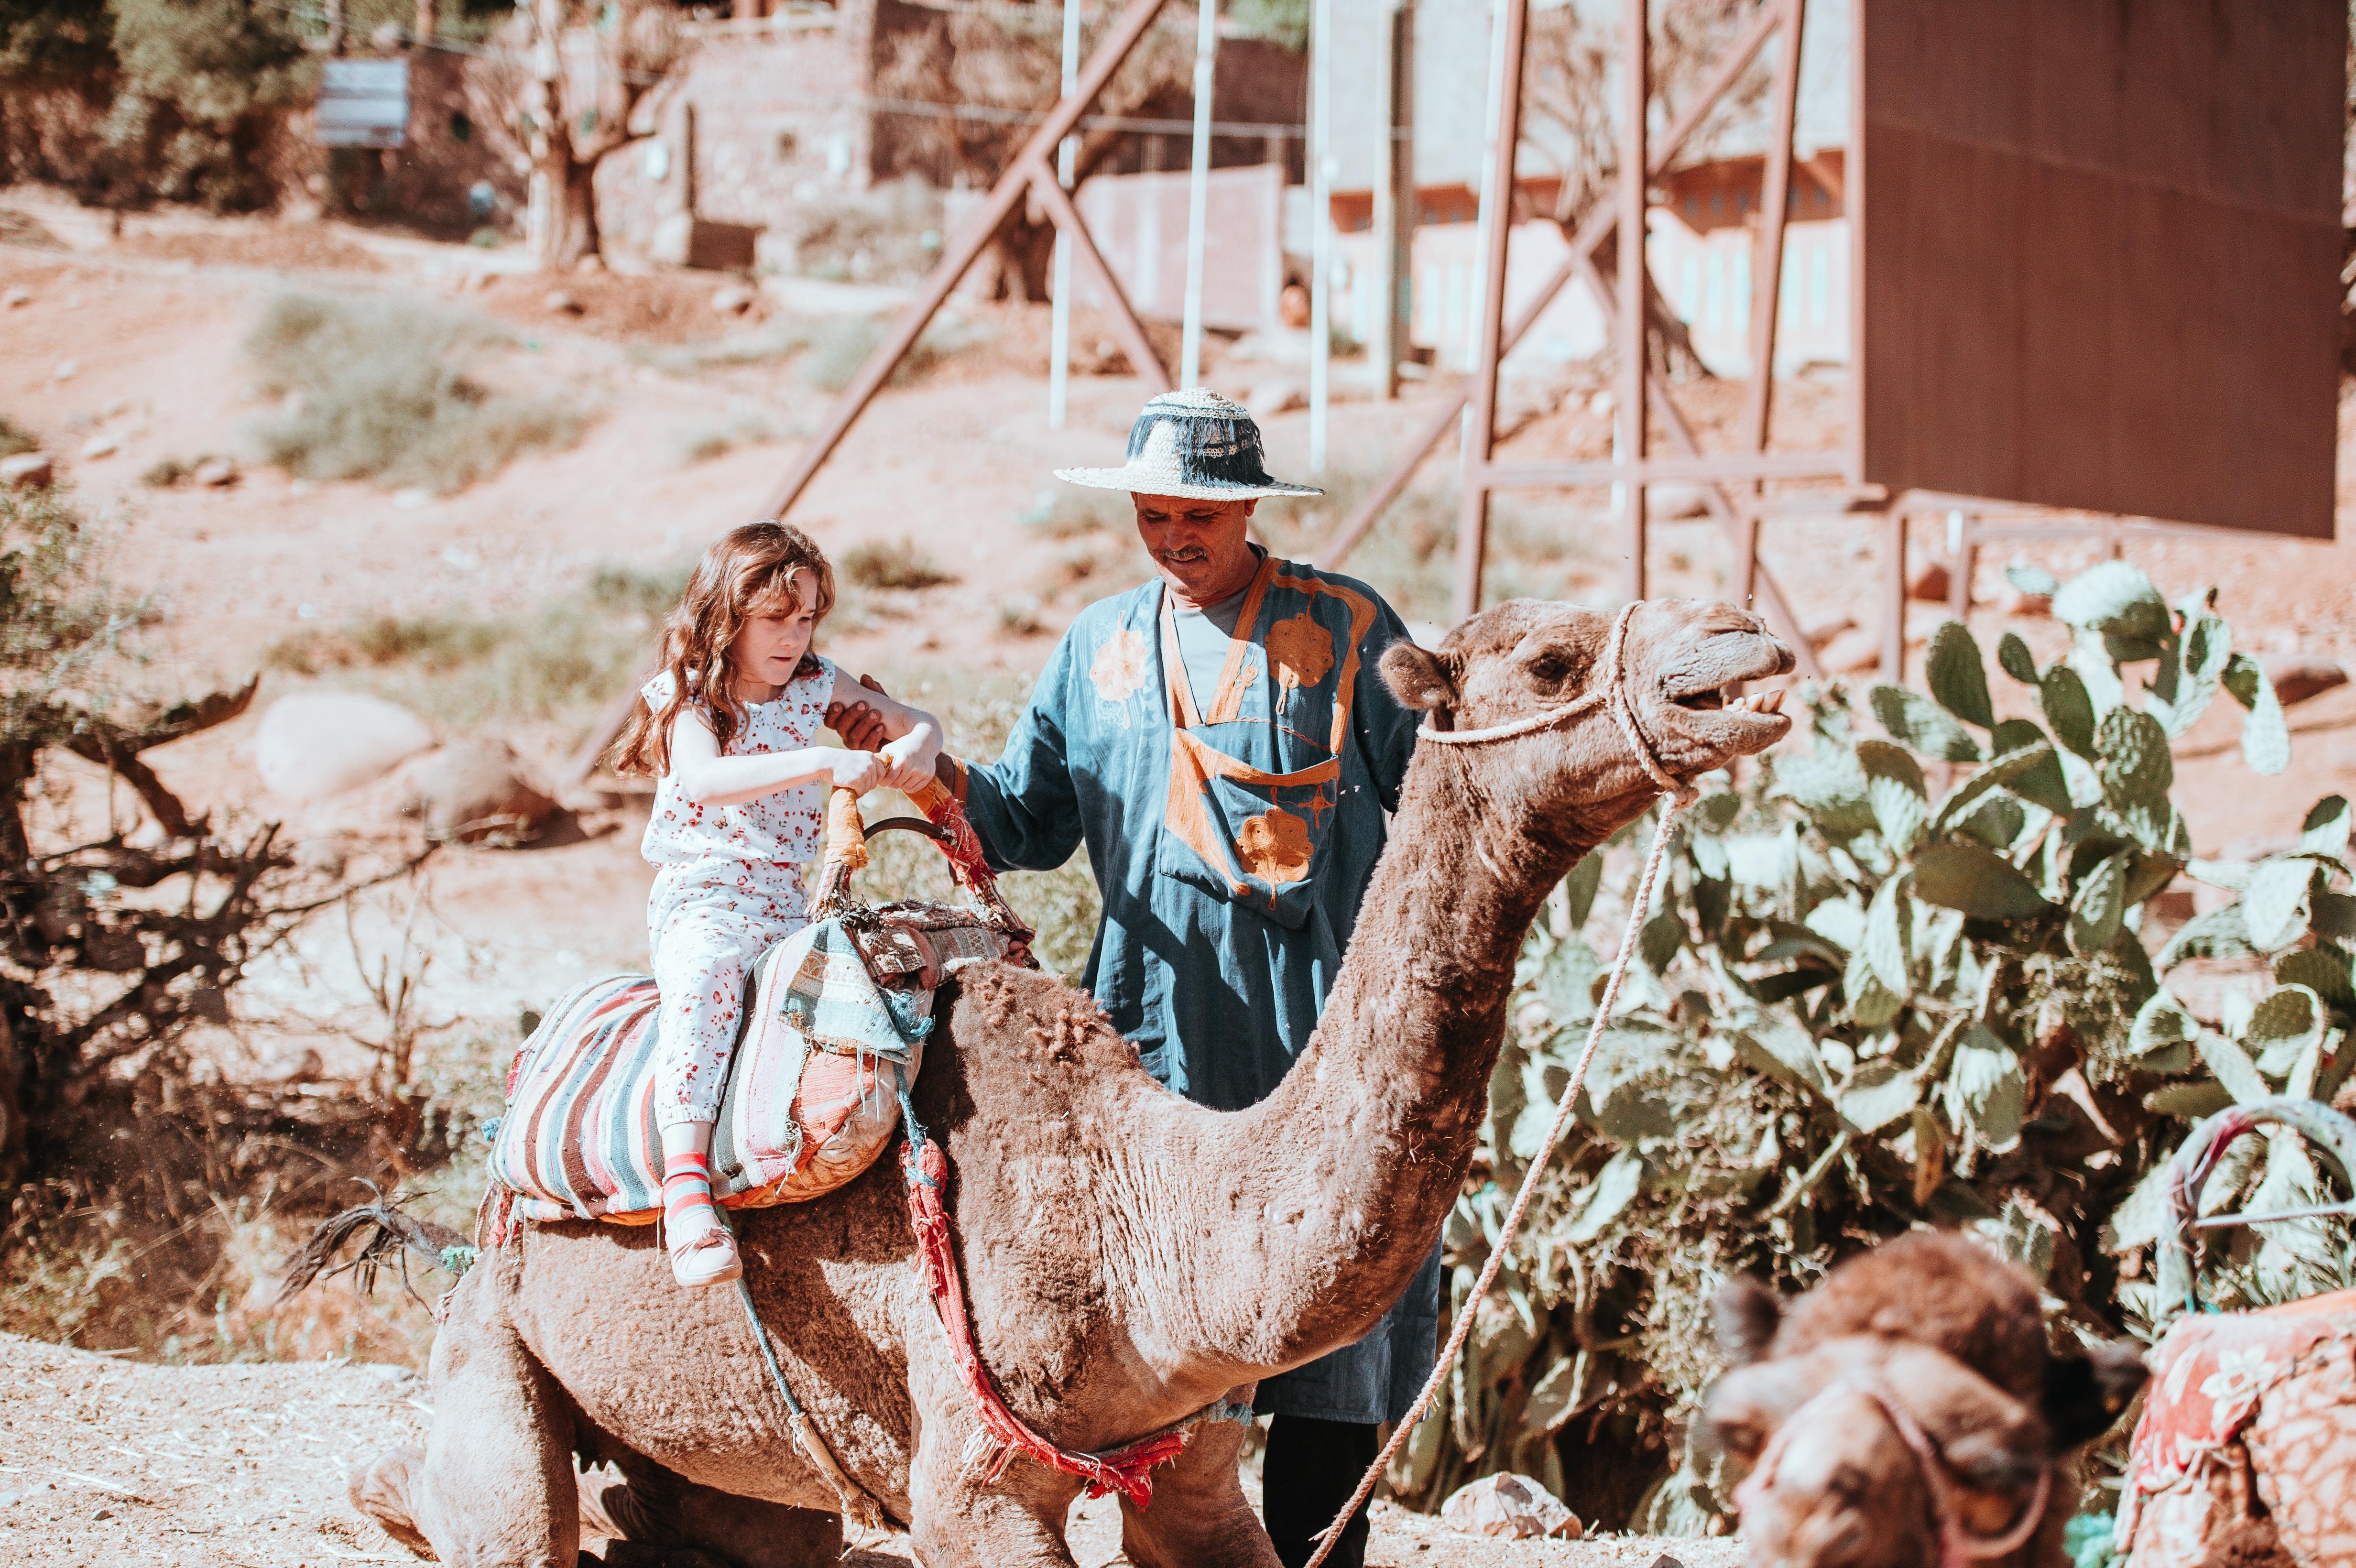 girl riding on brown camel during daytime